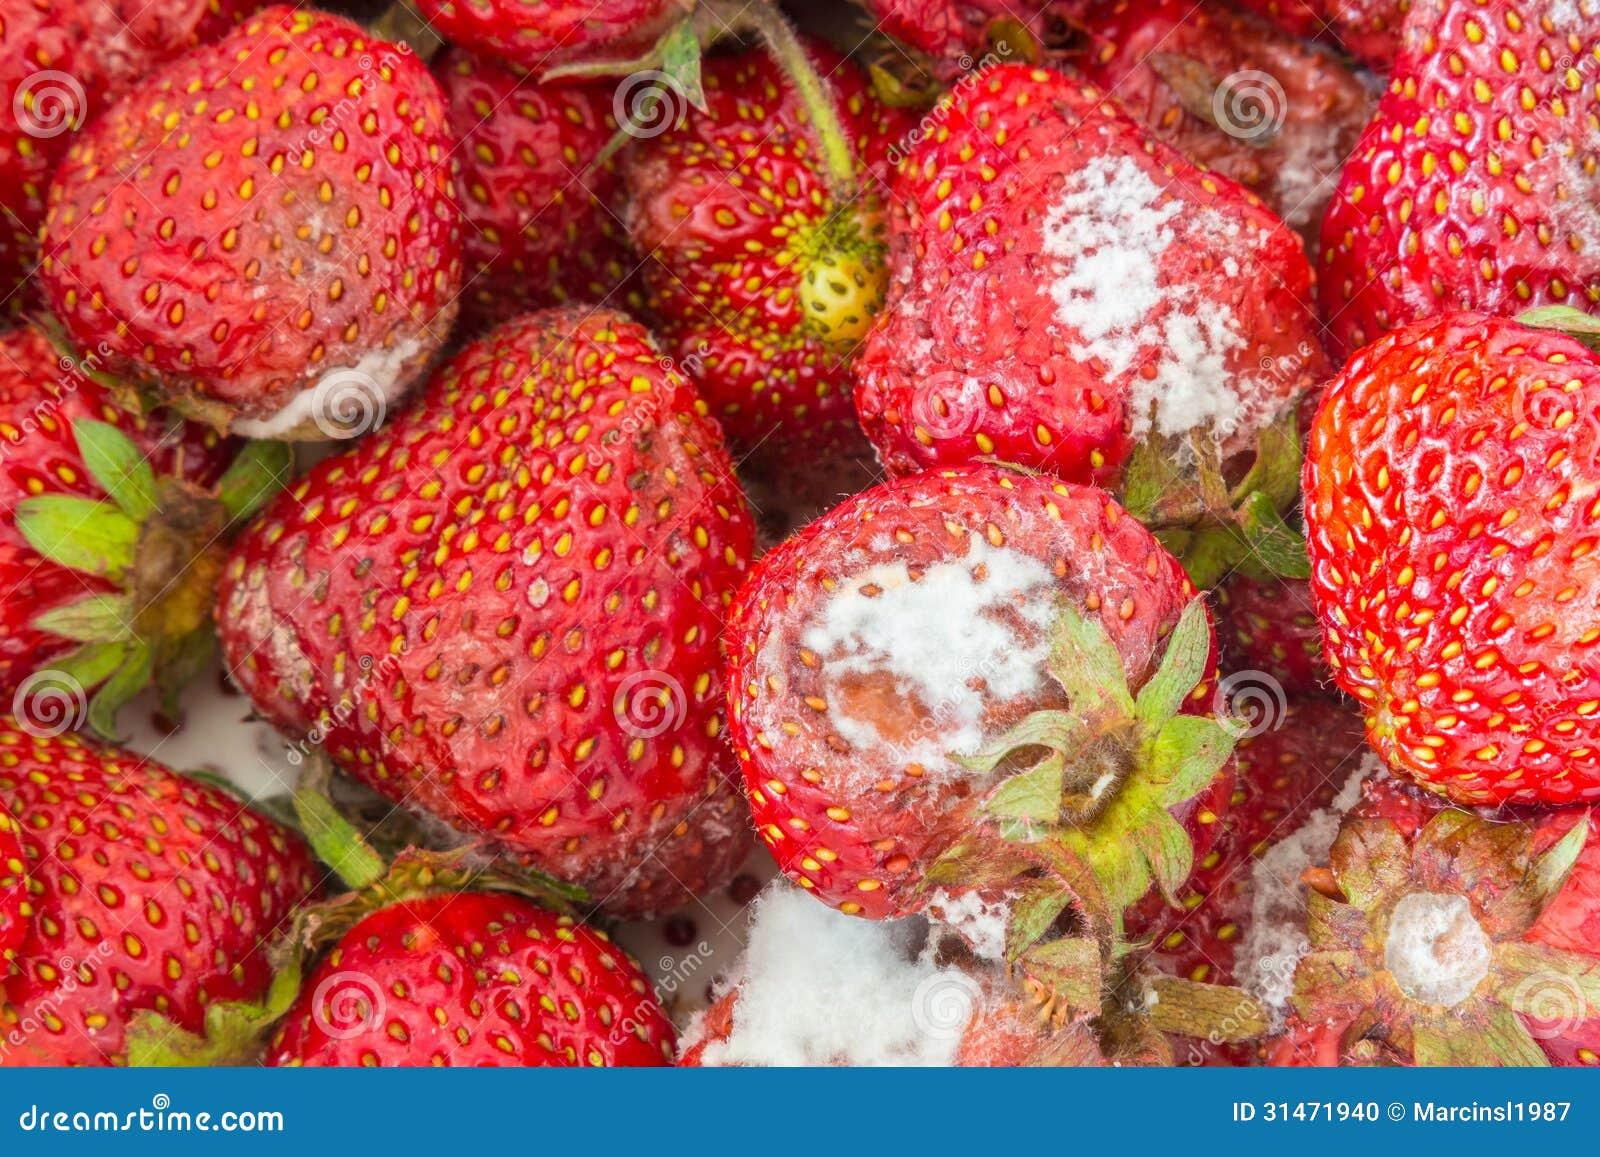 Rotten Strawberries Moldy Strawberries Sto...